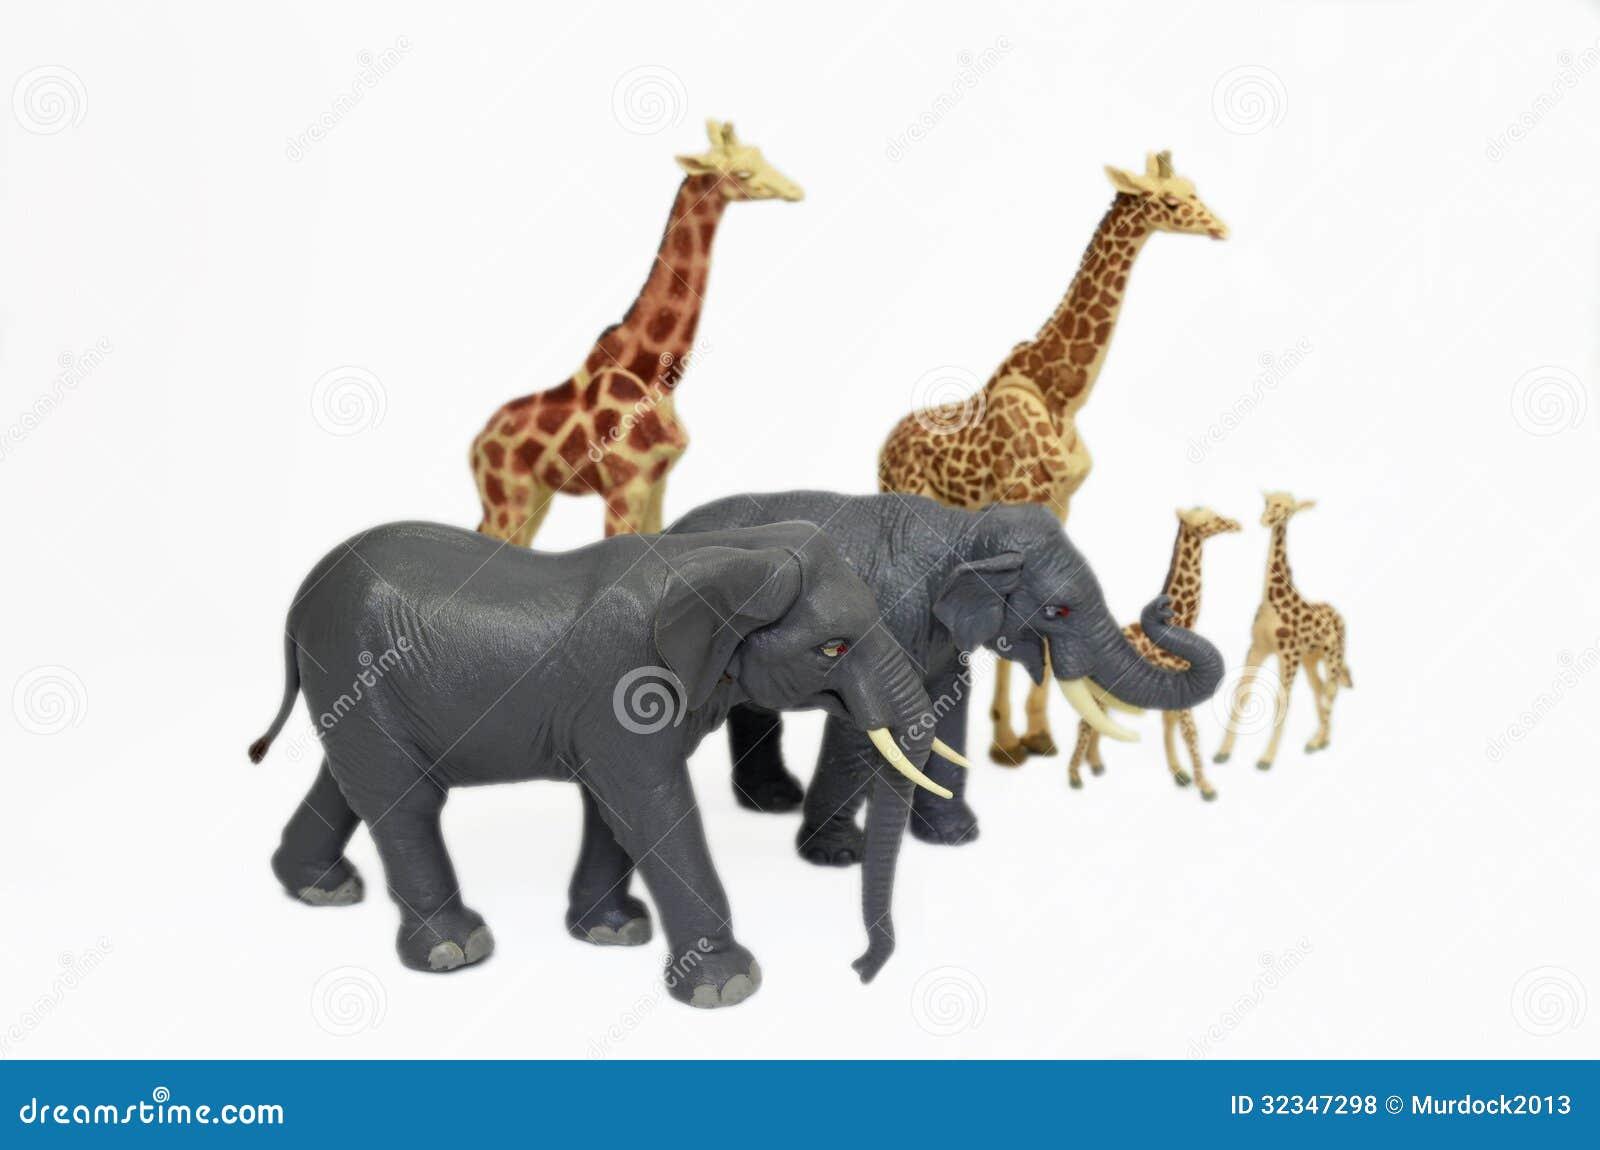 Zoo animals toys - photo#15